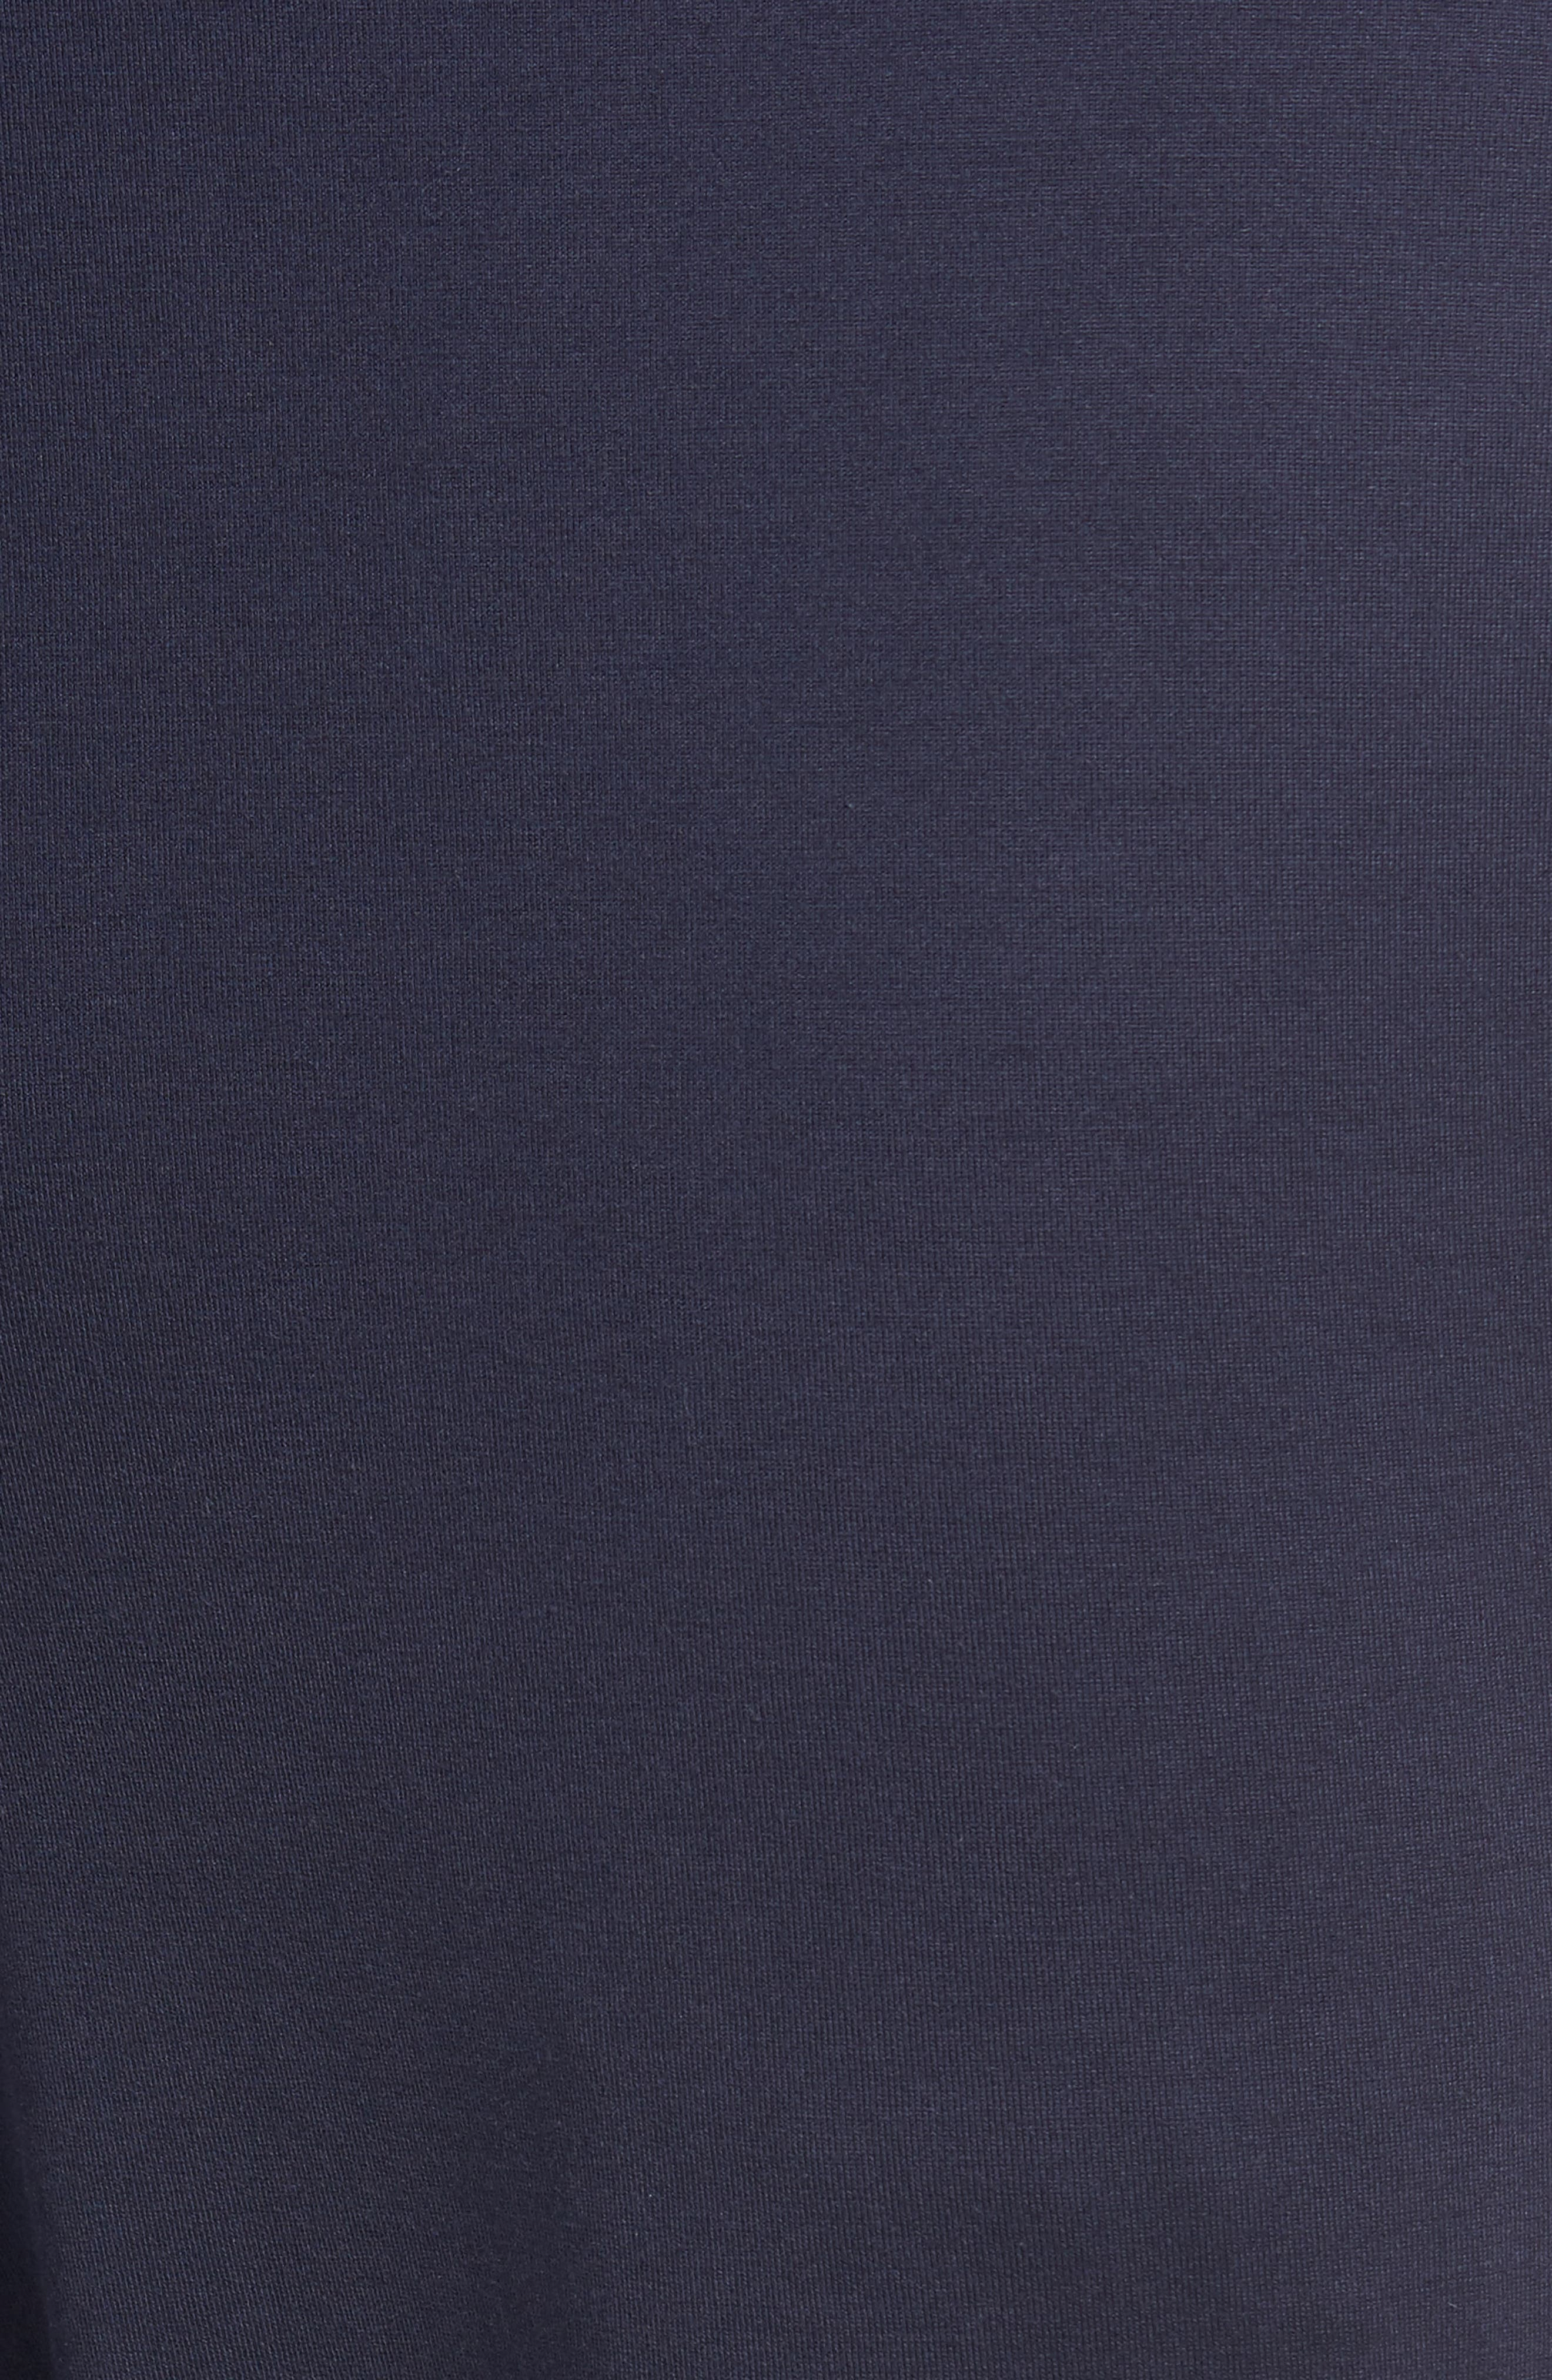 HANRO,                             Night & Day Knit Lounge Pants,                             Alternate thumbnail 5, color,                             BLACK IRIS